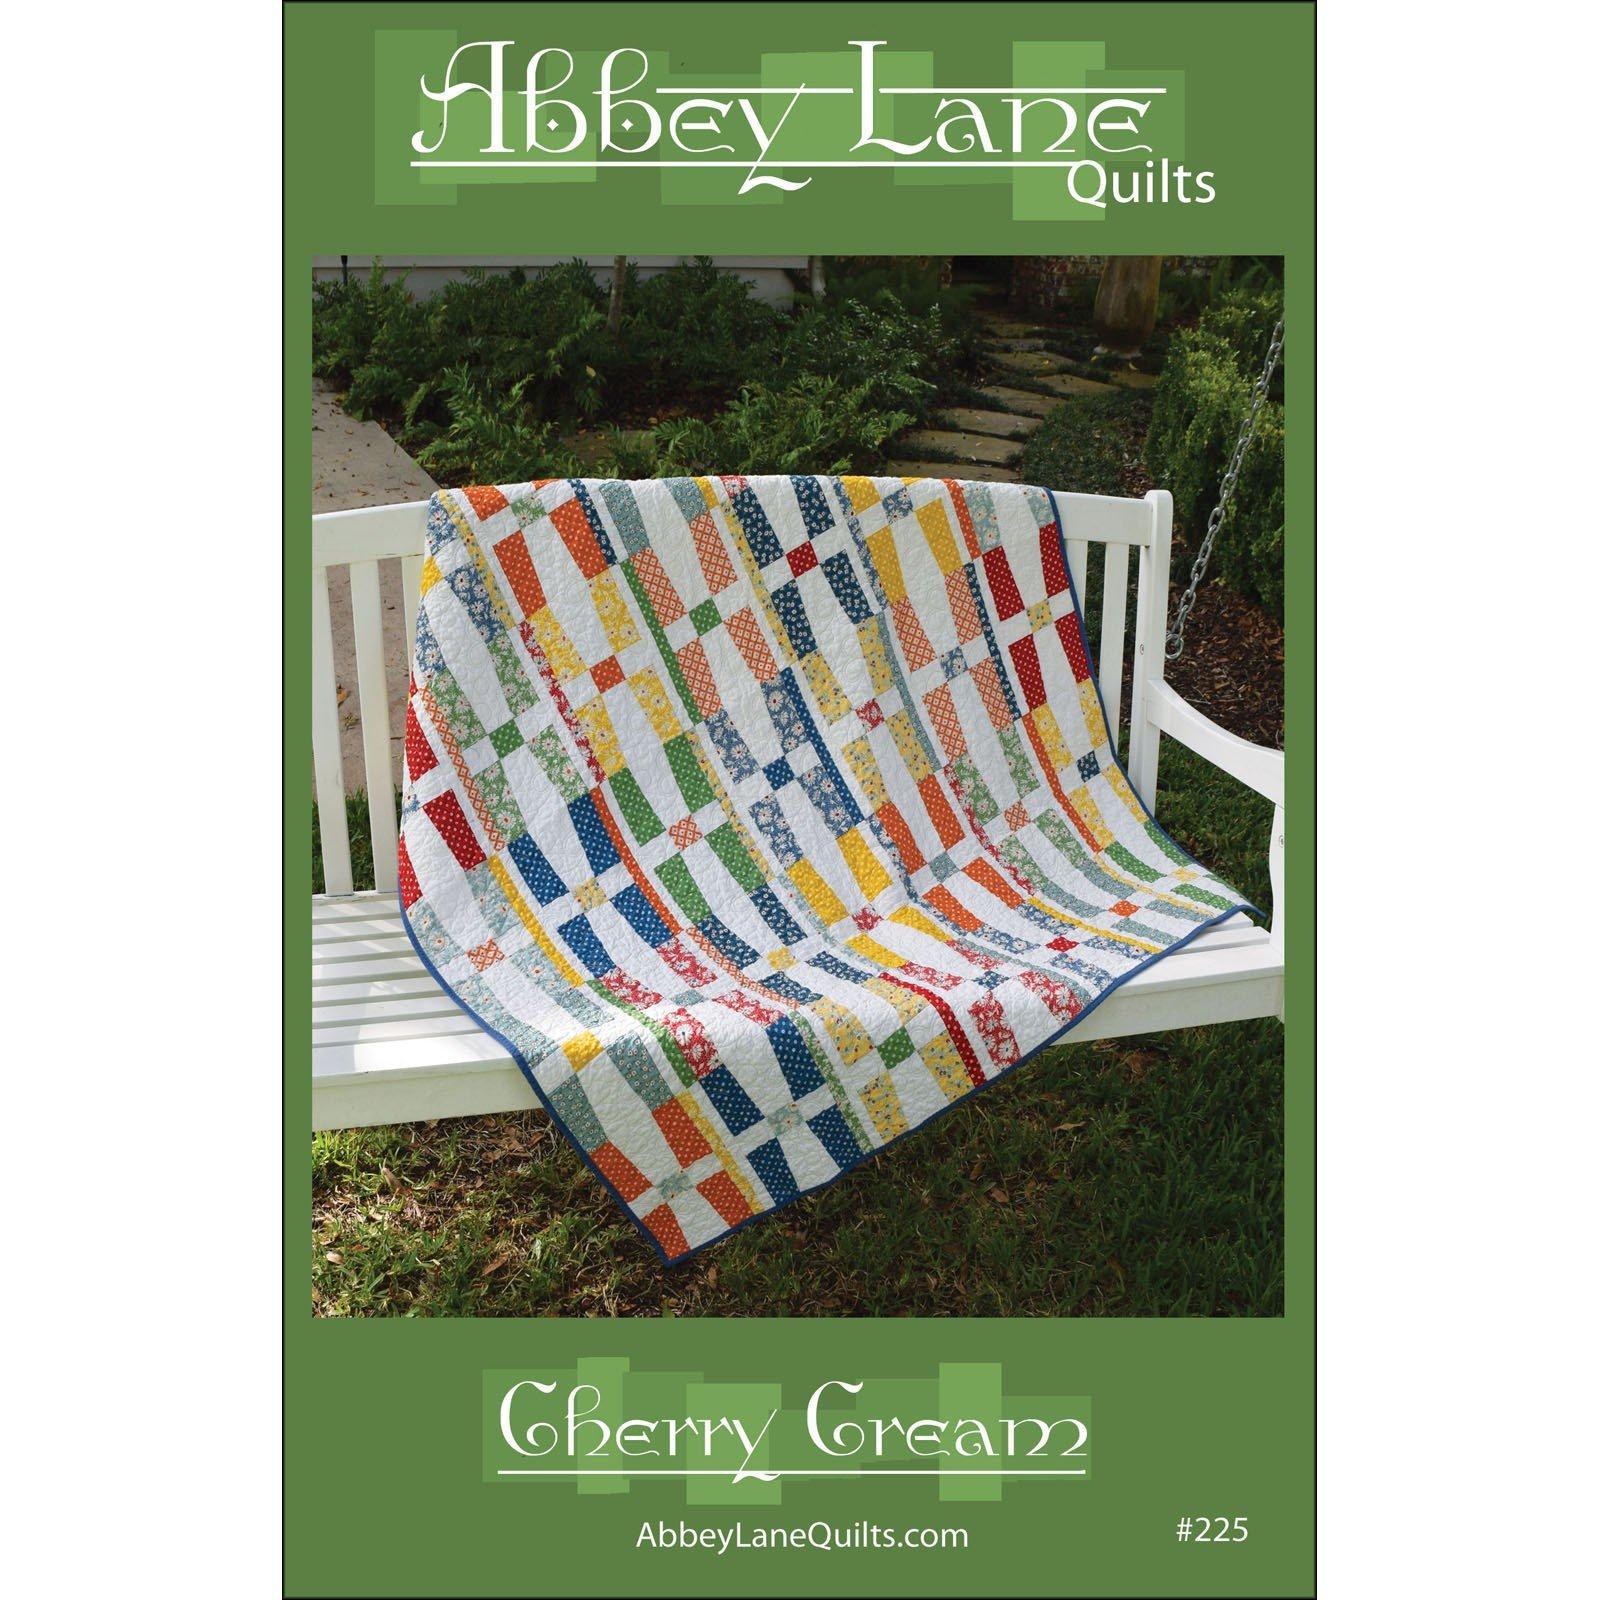 Cherry Cream<br/>Abbey Lane Quilts